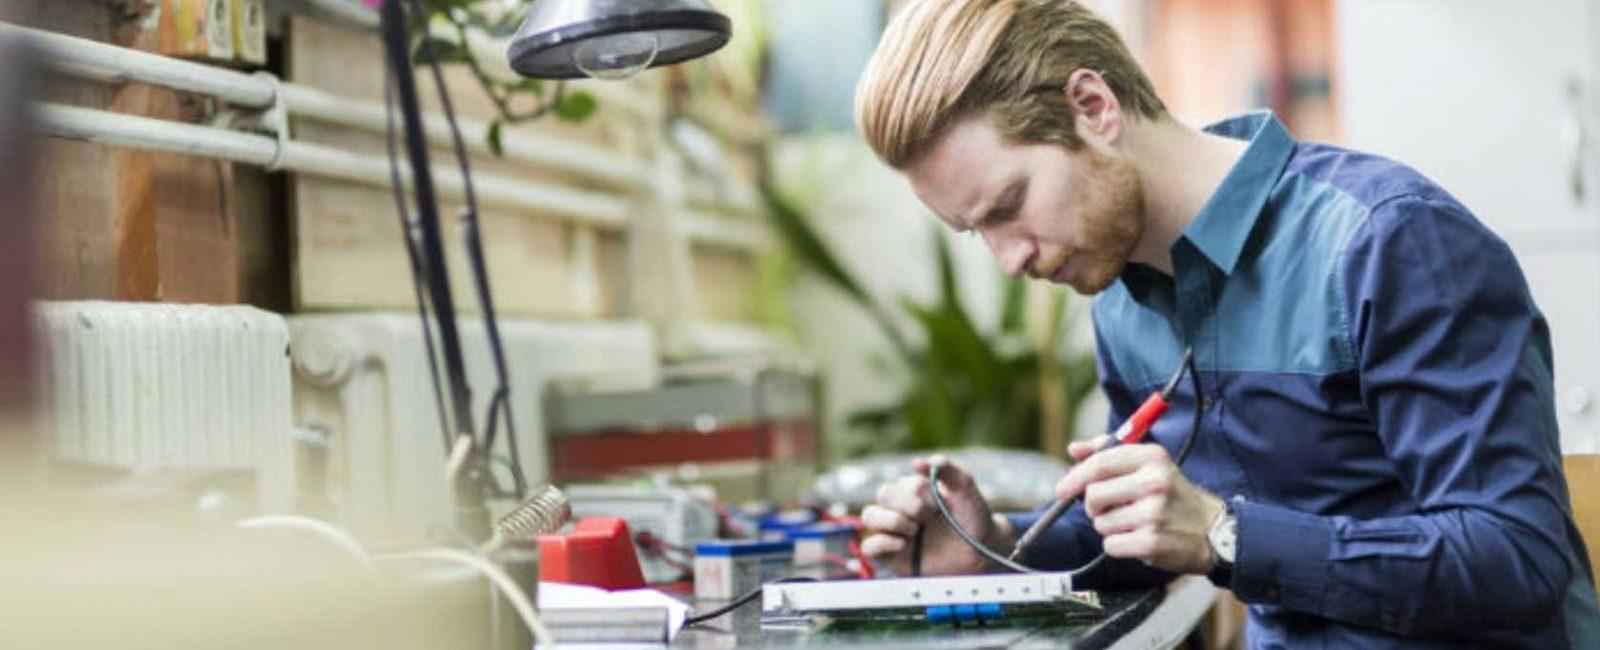 Electronic Engineering Traits